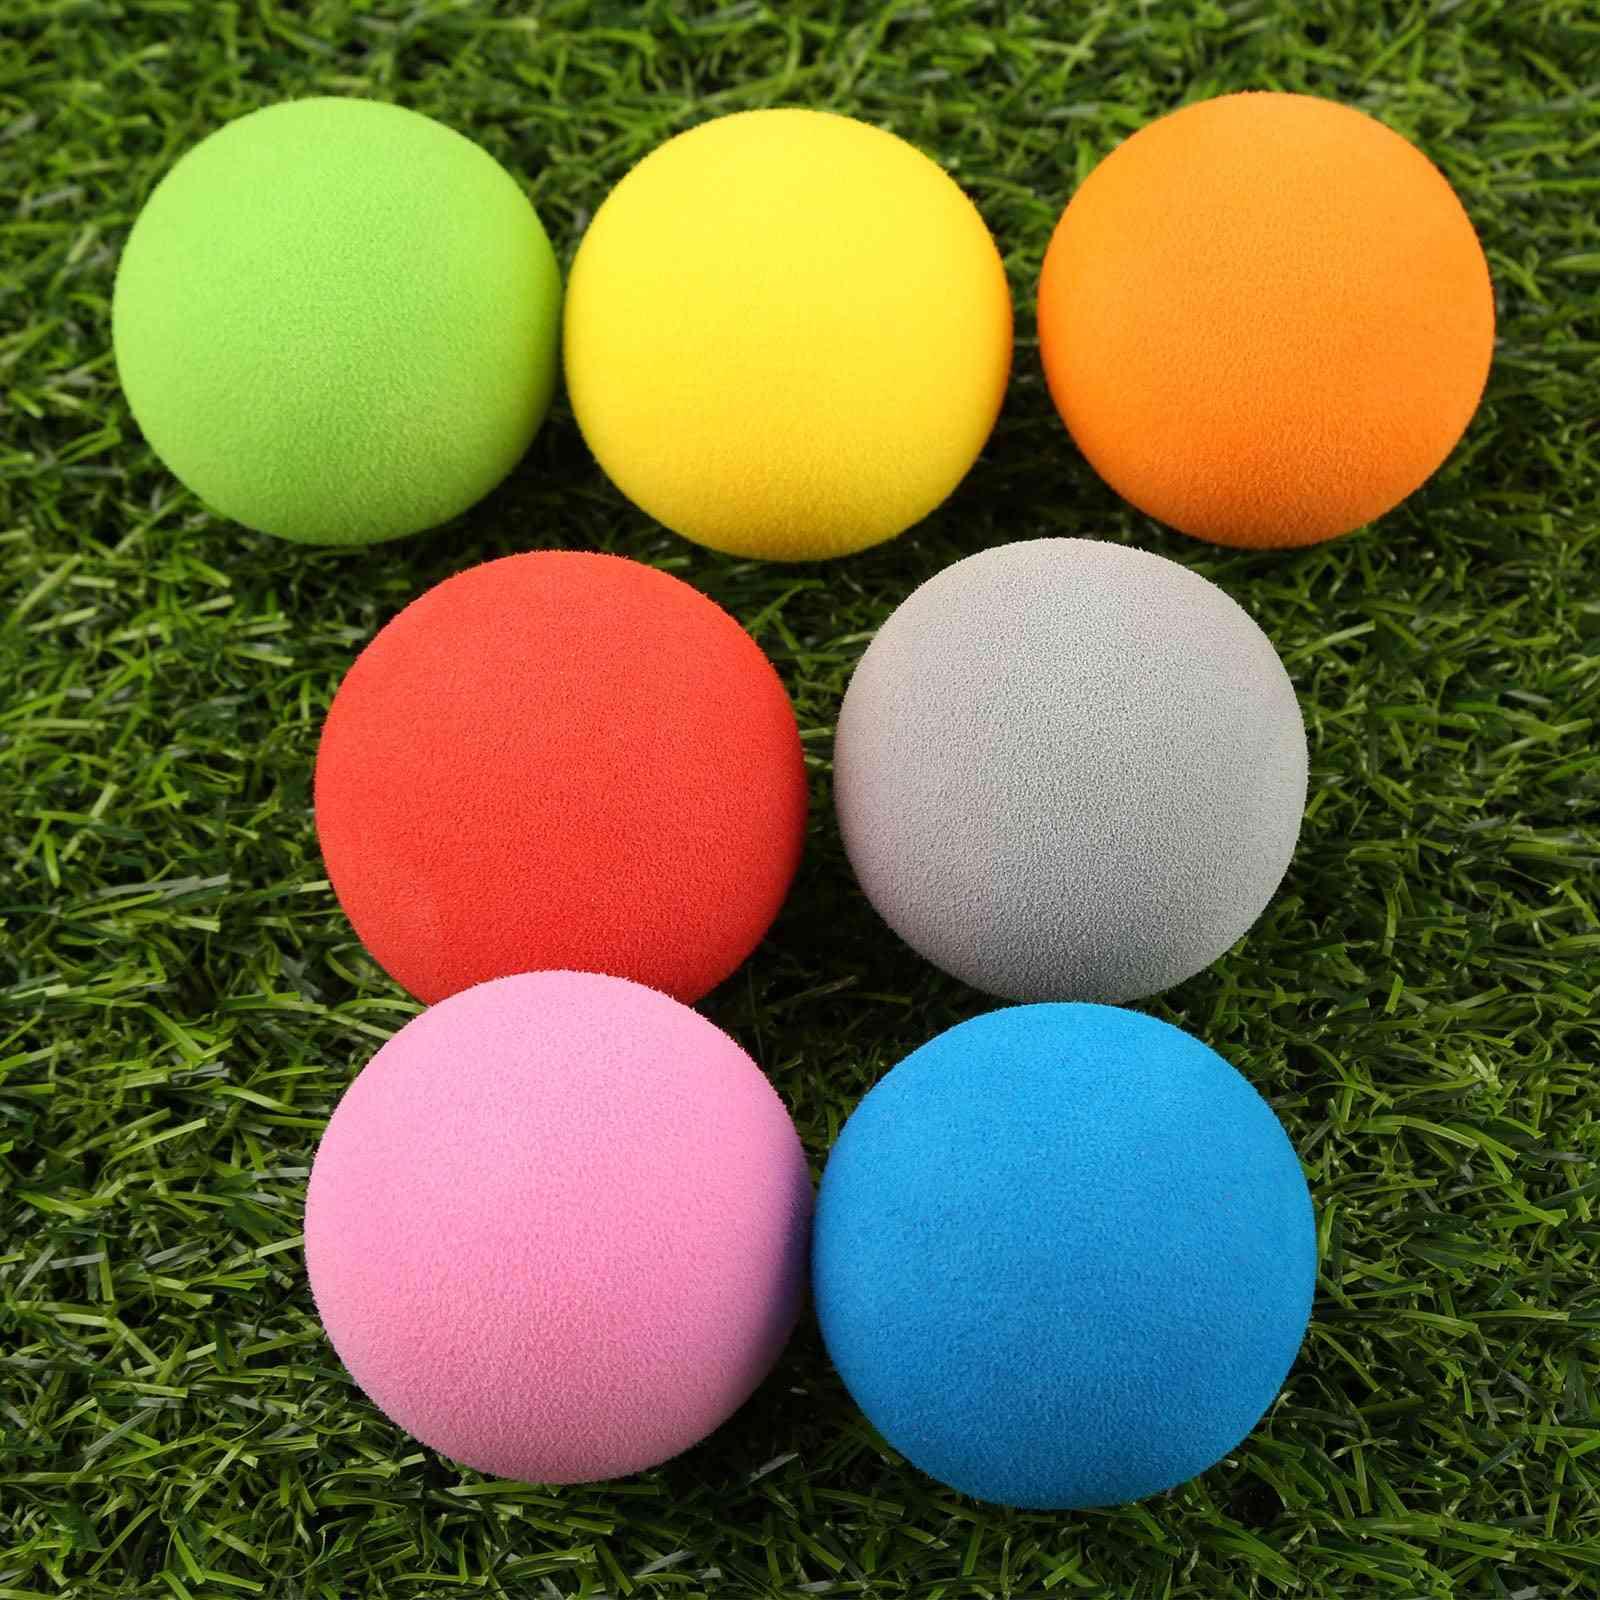 Golf Eva Foam, Soft Sponge Balls For Golf/tennis Training, Outdoor, Golf Practice Balls